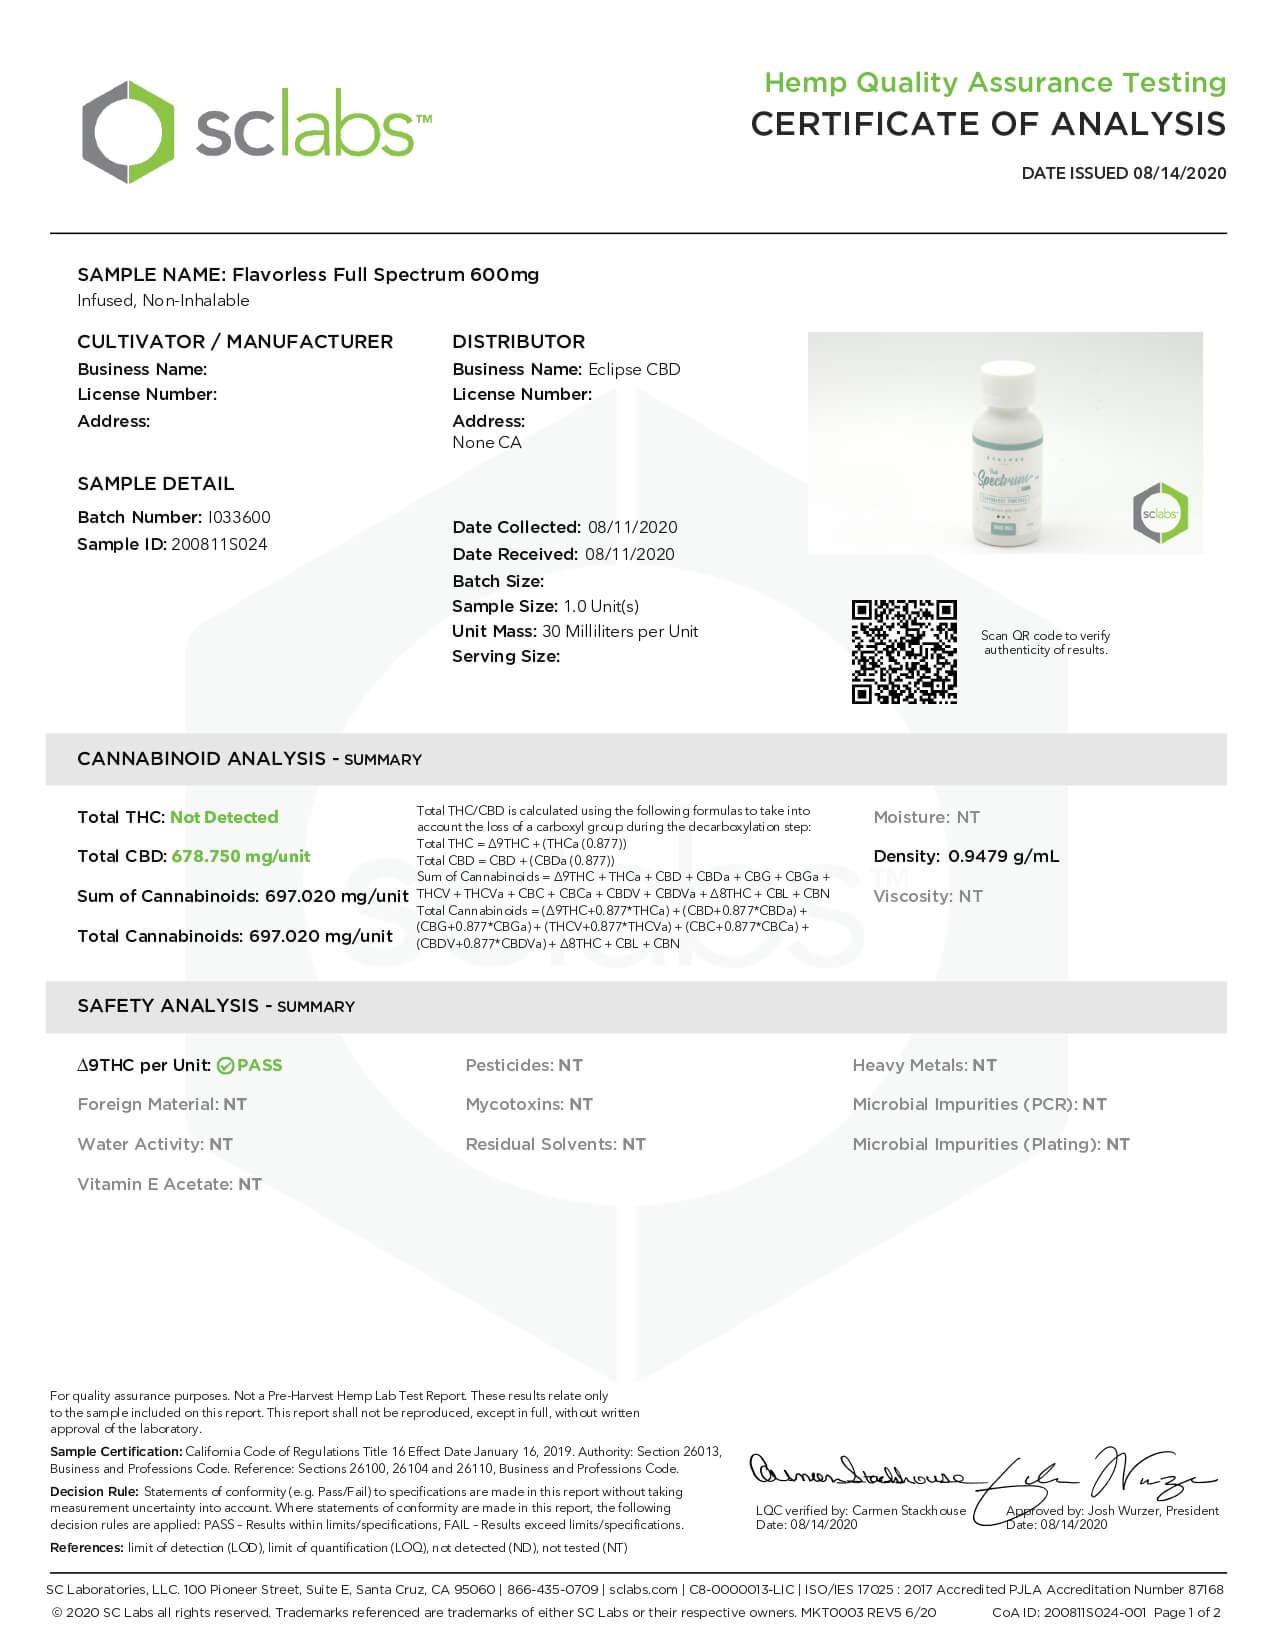 Eclipse CBD Tincture Full Spectrum Unflavored 600mg Lab Report